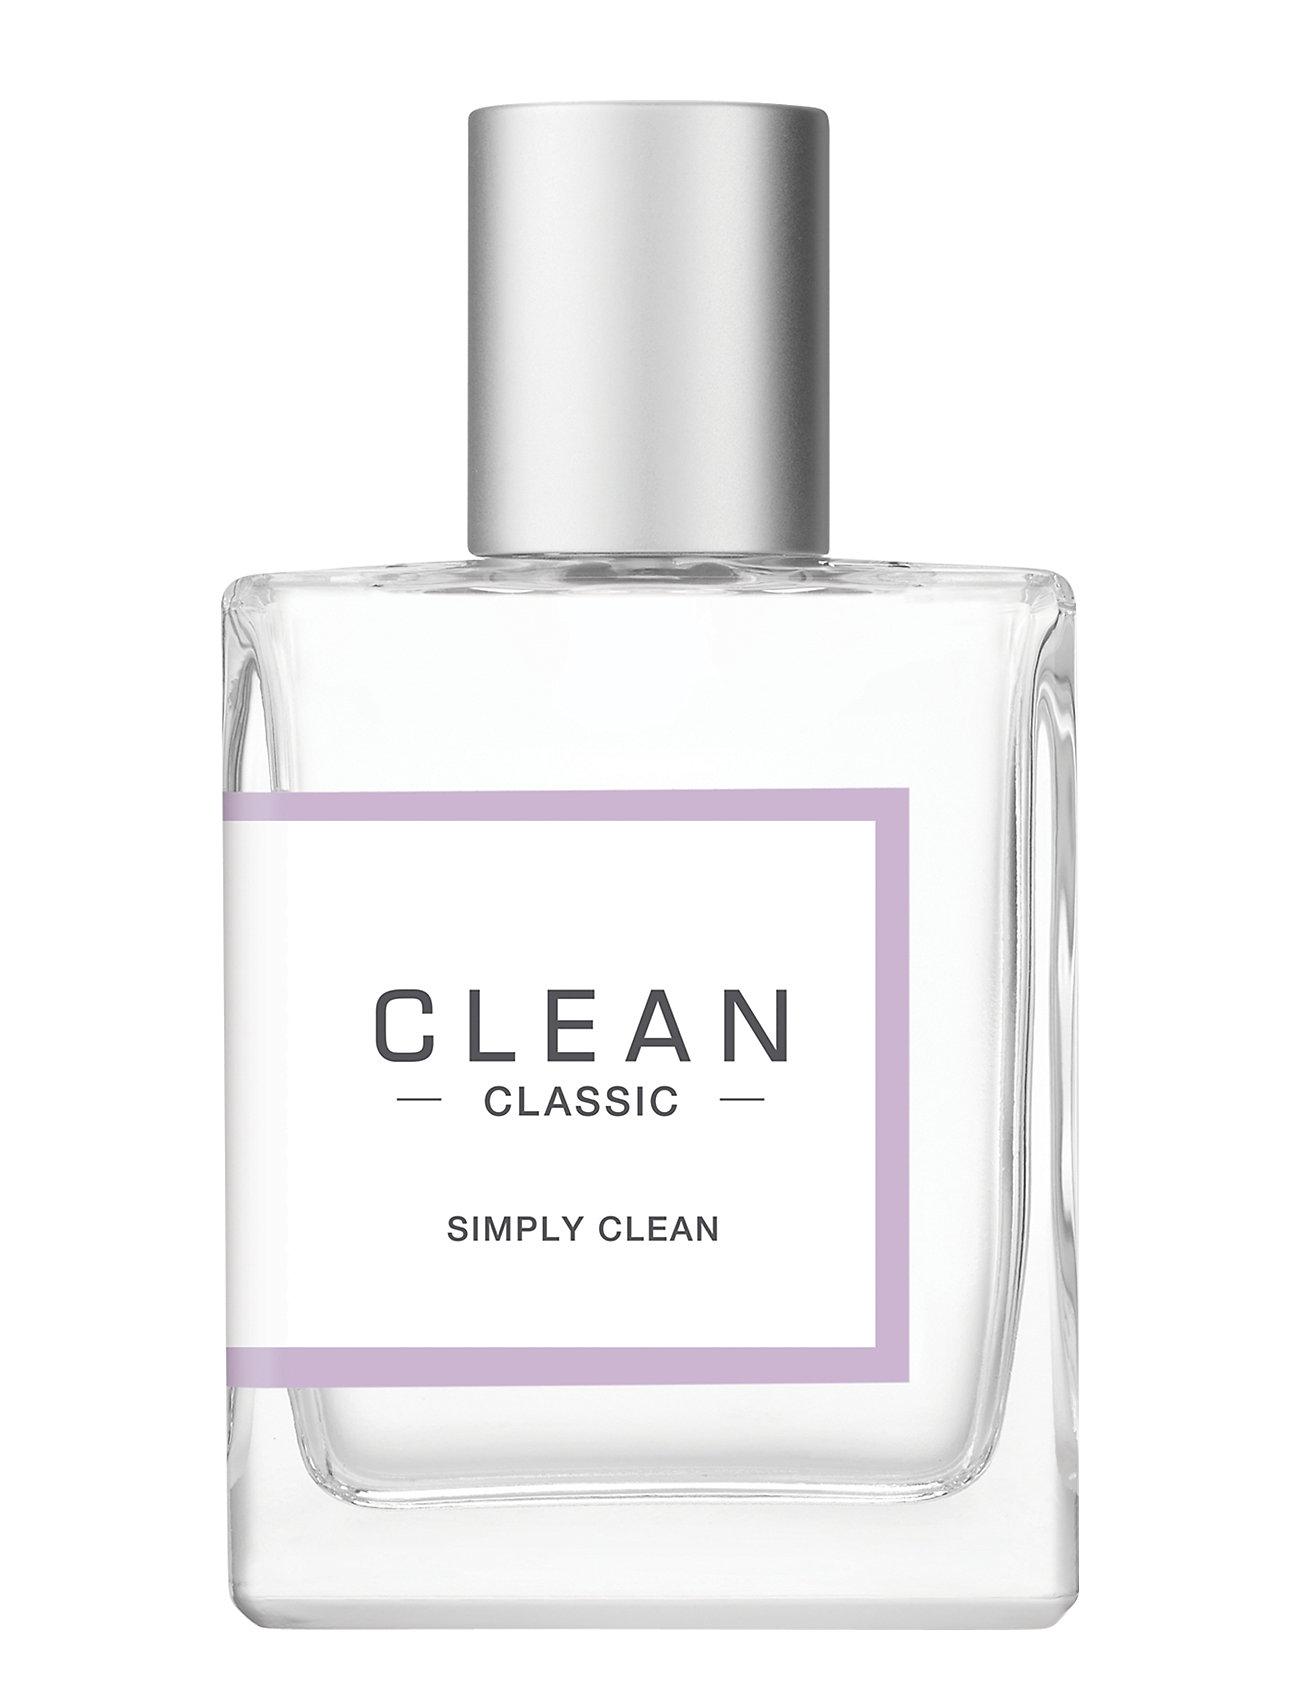 CLEAN Simply Clean Eau de Parfum - CLEAR